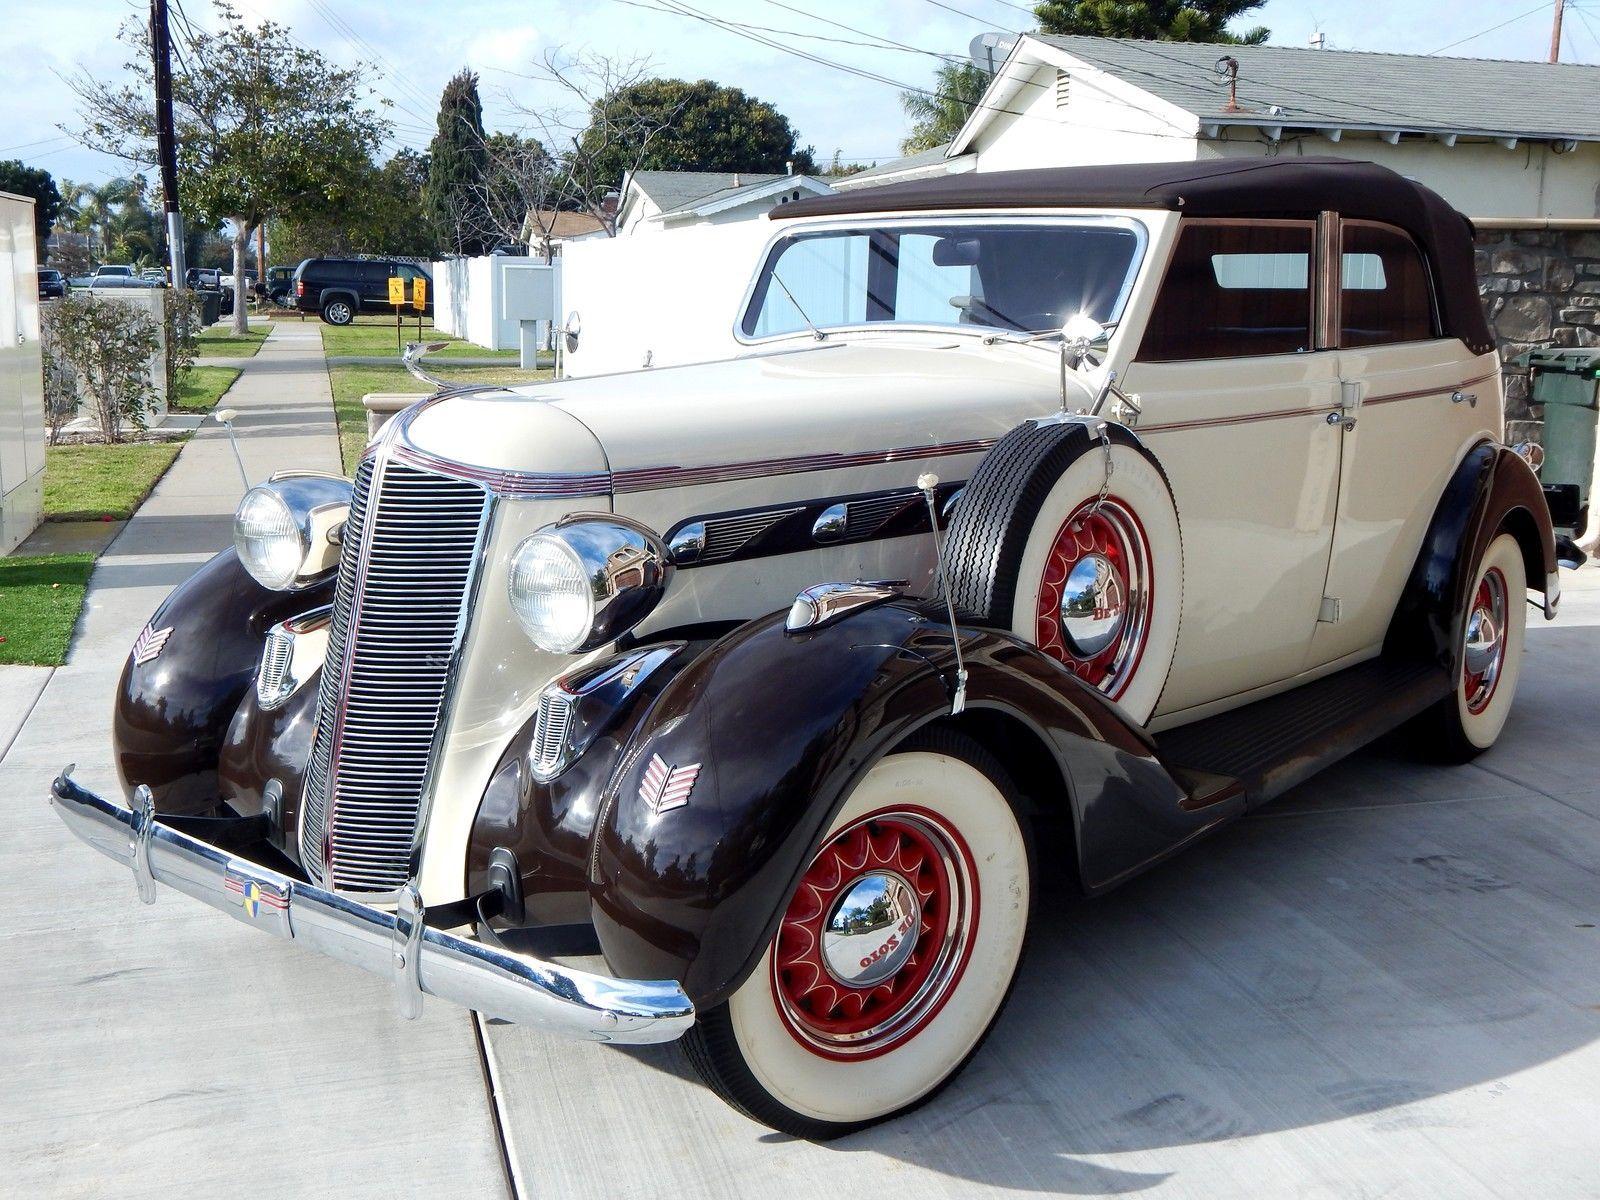 1956 desoto firedome seville 4 door hardtop 1 of 10 - 1956 Desoto Firedome Seville 4 Door Hardtop 1 Of 10 52